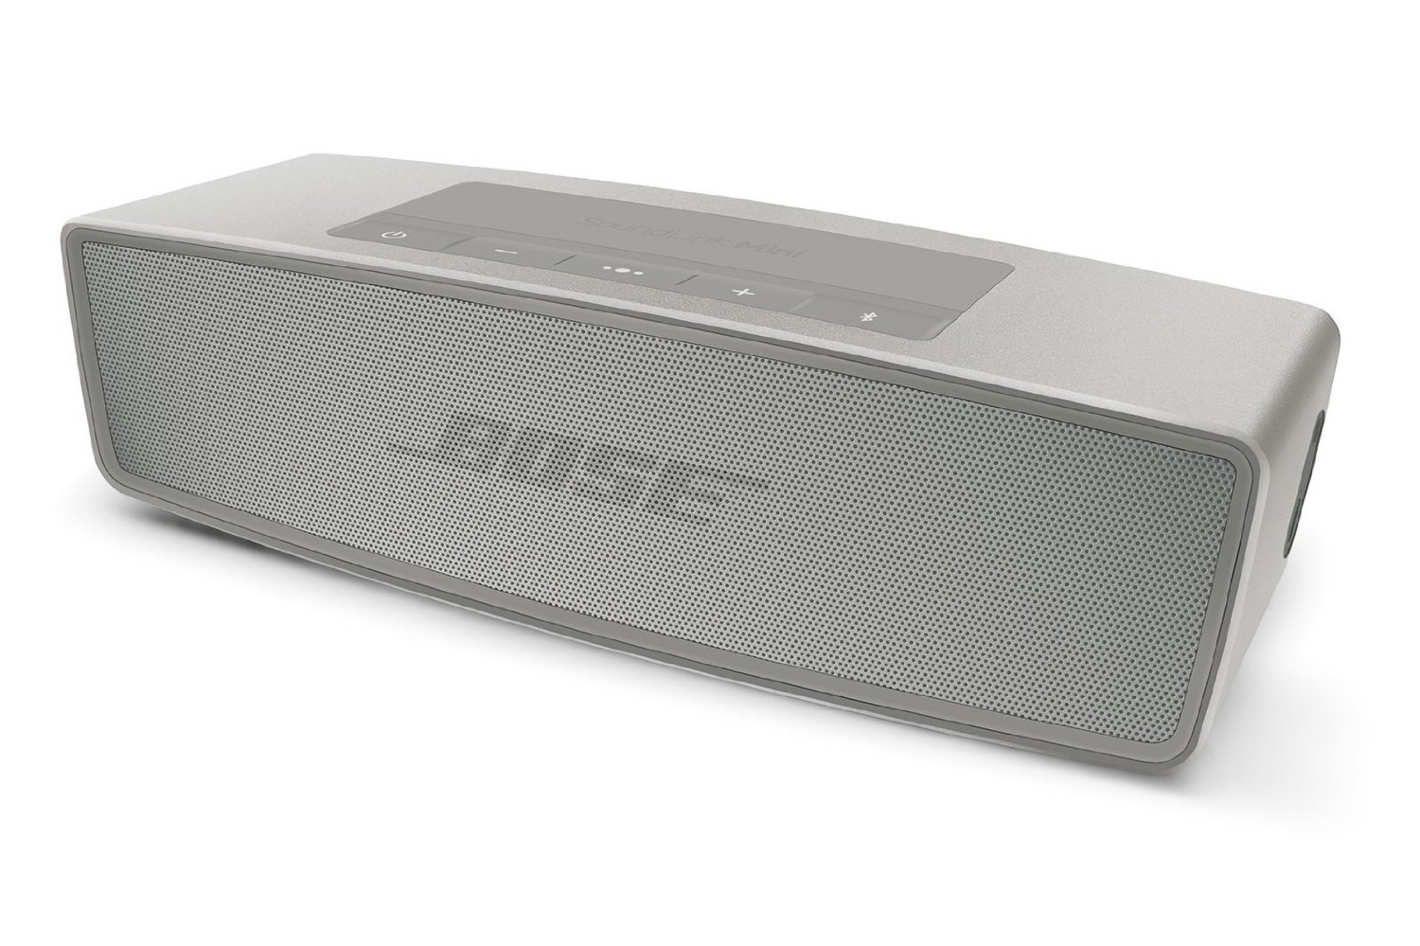 Image Result For Portable Speaker Bose Soundlink Mini Bose Soundlink Mini Ii Bluetooth Speaker